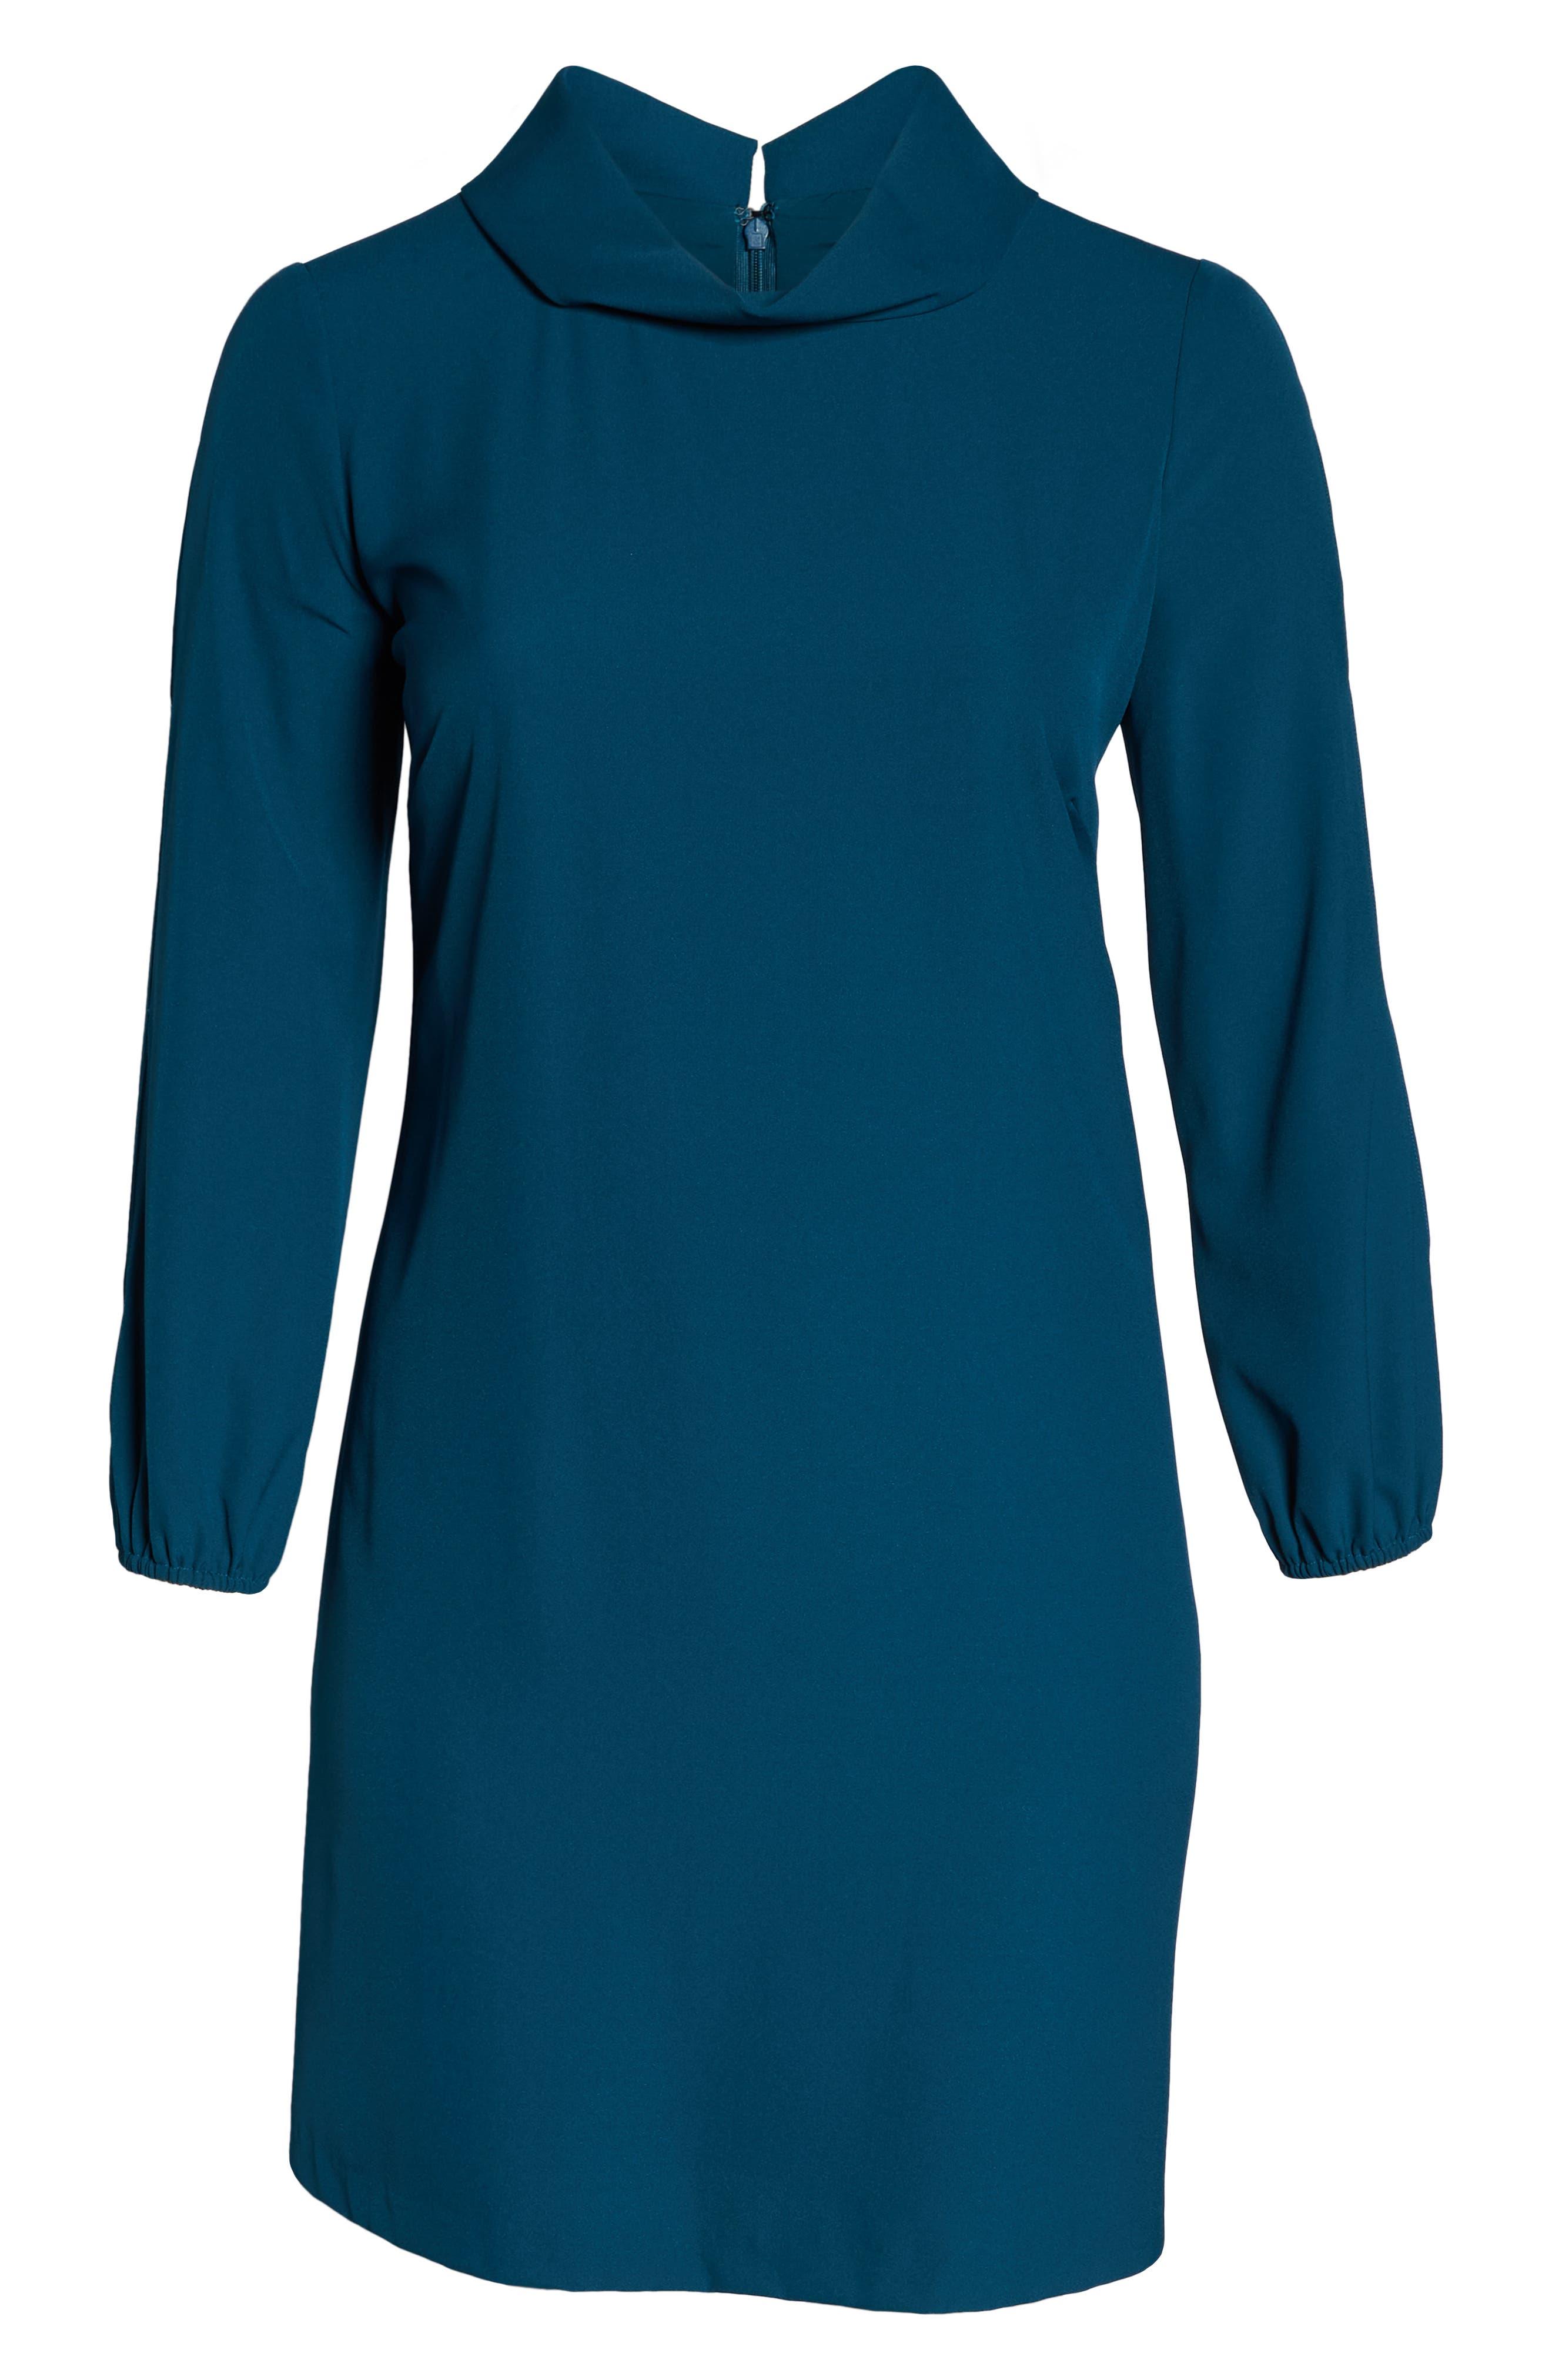 Long Split Sleeve Crepe Sheath Dress,                             Alternate thumbnail 7, color,                             OCEAN TEAL